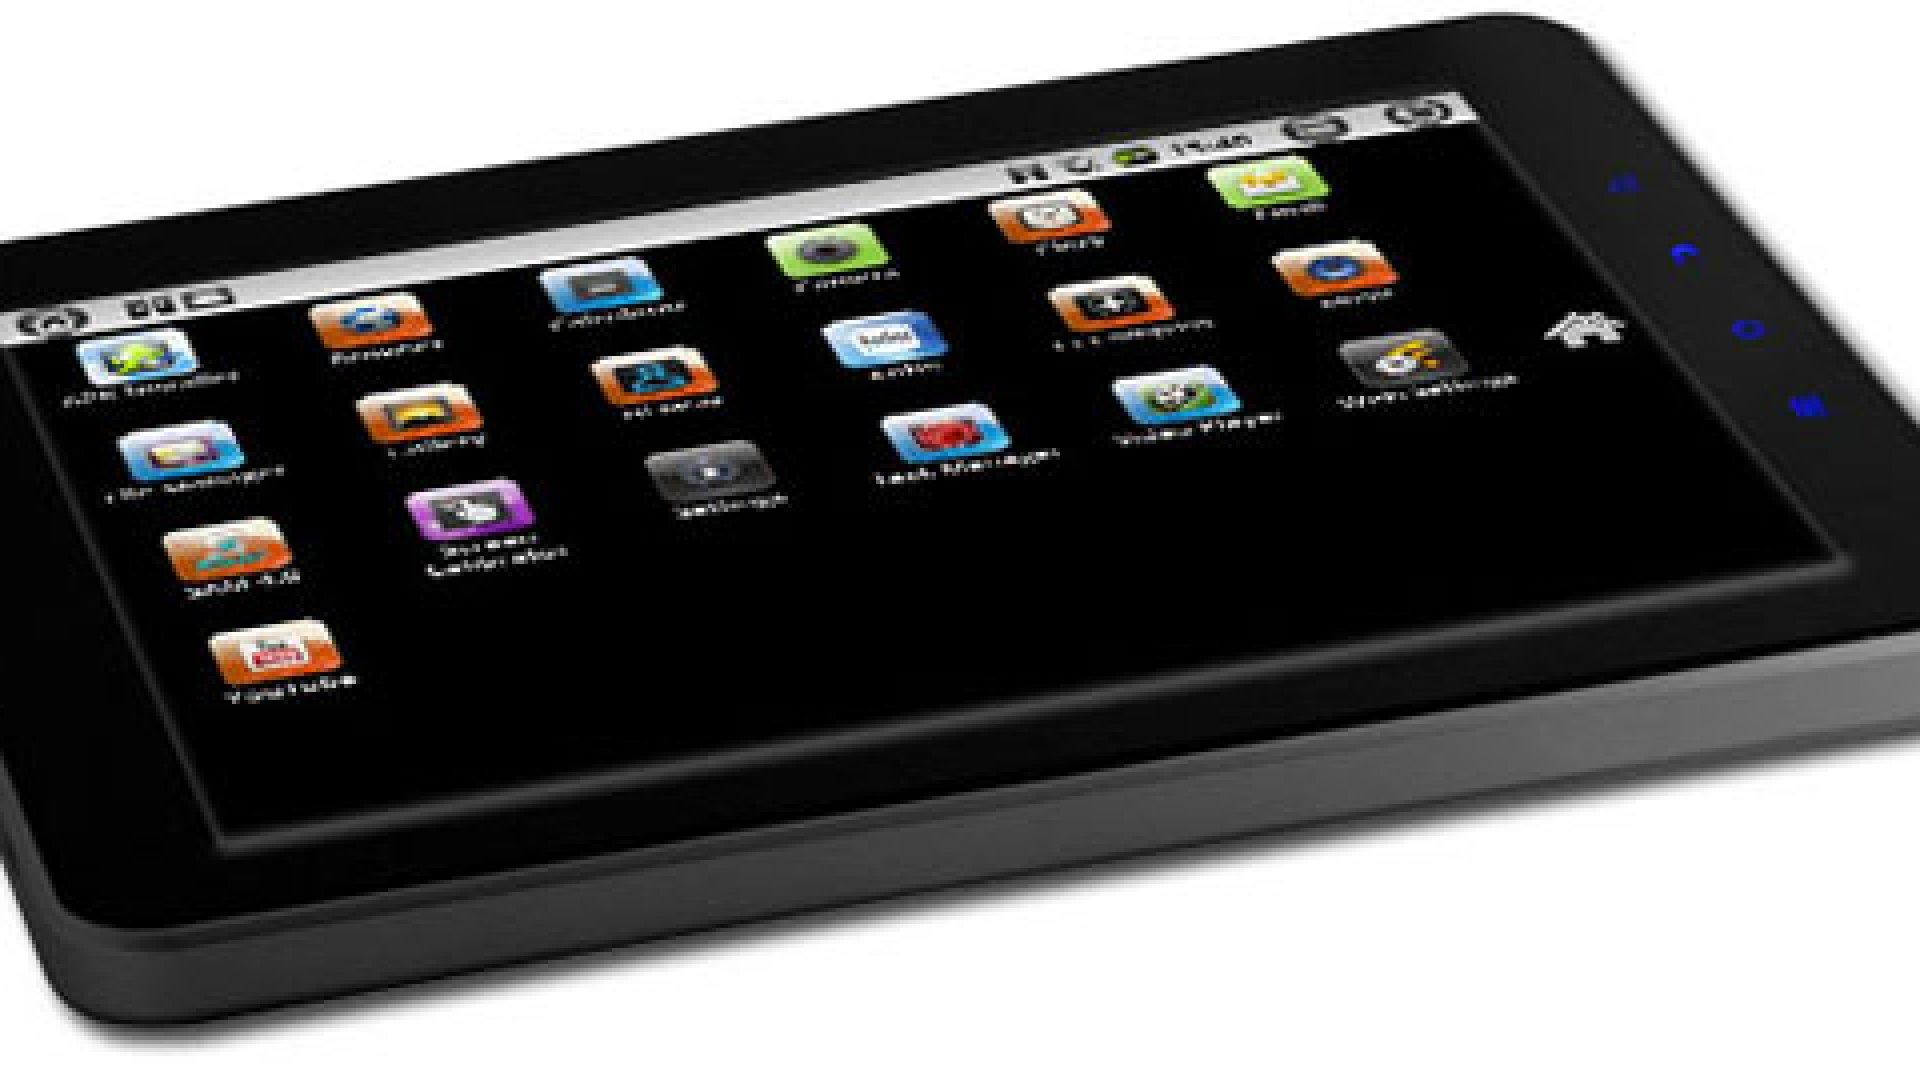 Competing Against Apple's iPad: Crazy or Brilliant?